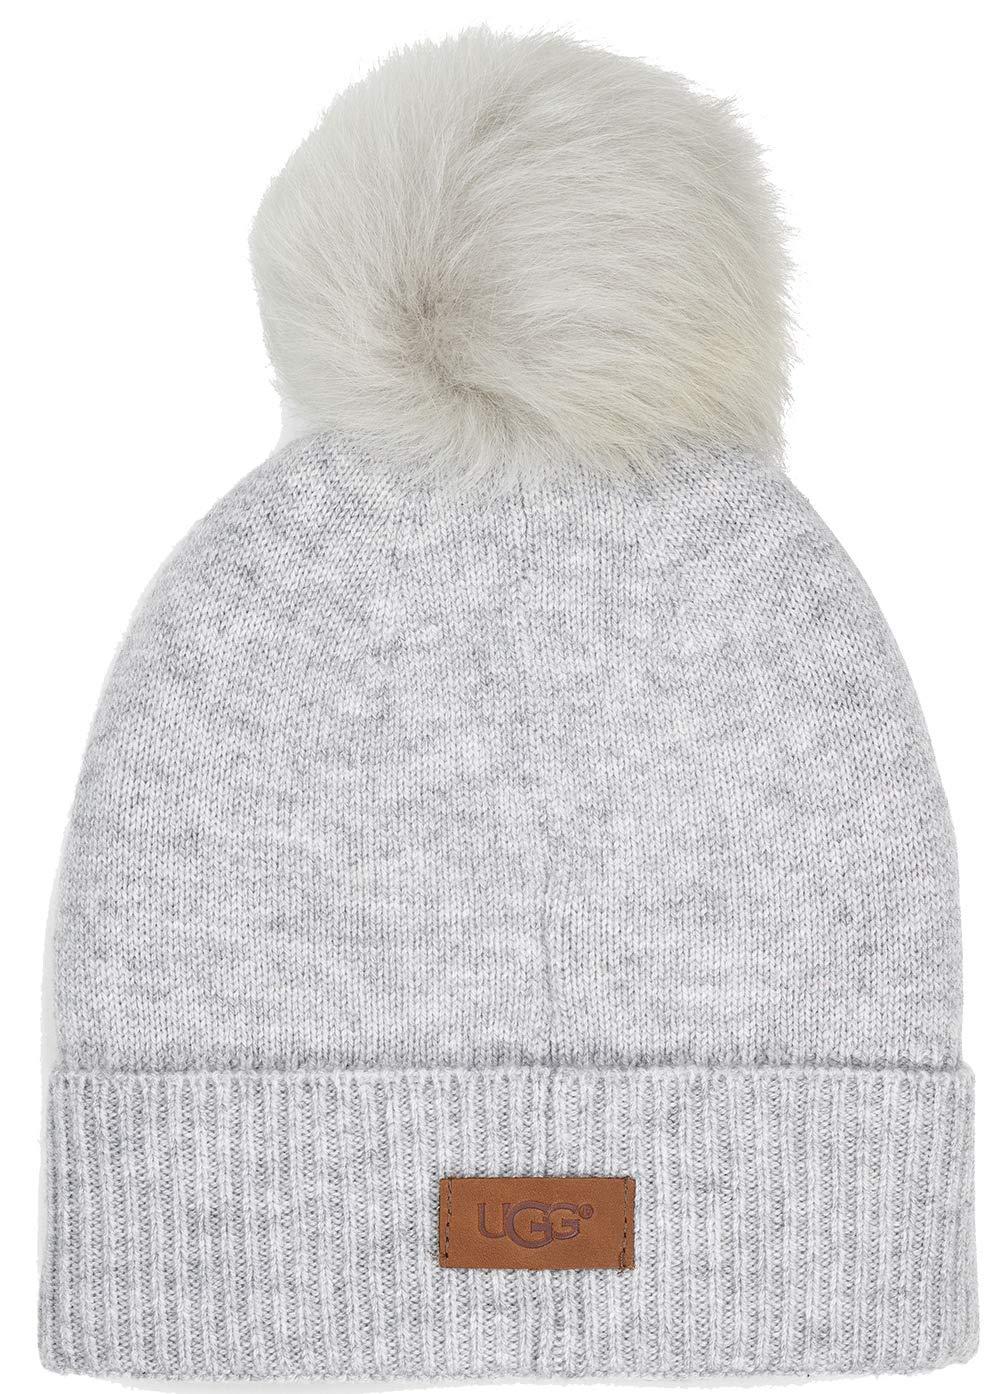 UGG Women's Luxe Knit with Sheepskin Pom Hat Light Grey One Size